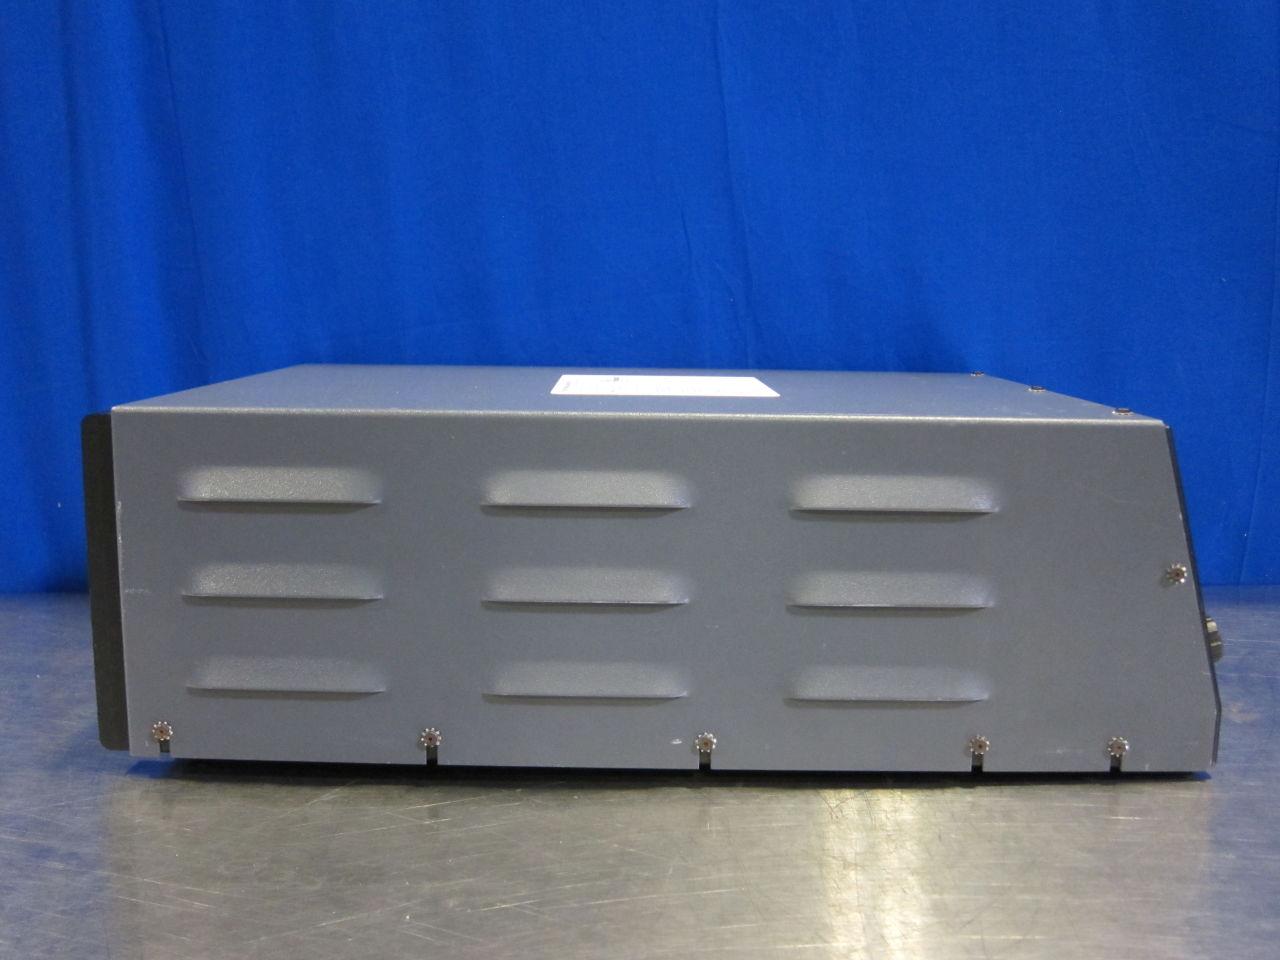 BOSTON SCIENTIFIC EPT-1000 XP Electrosurgical Unit